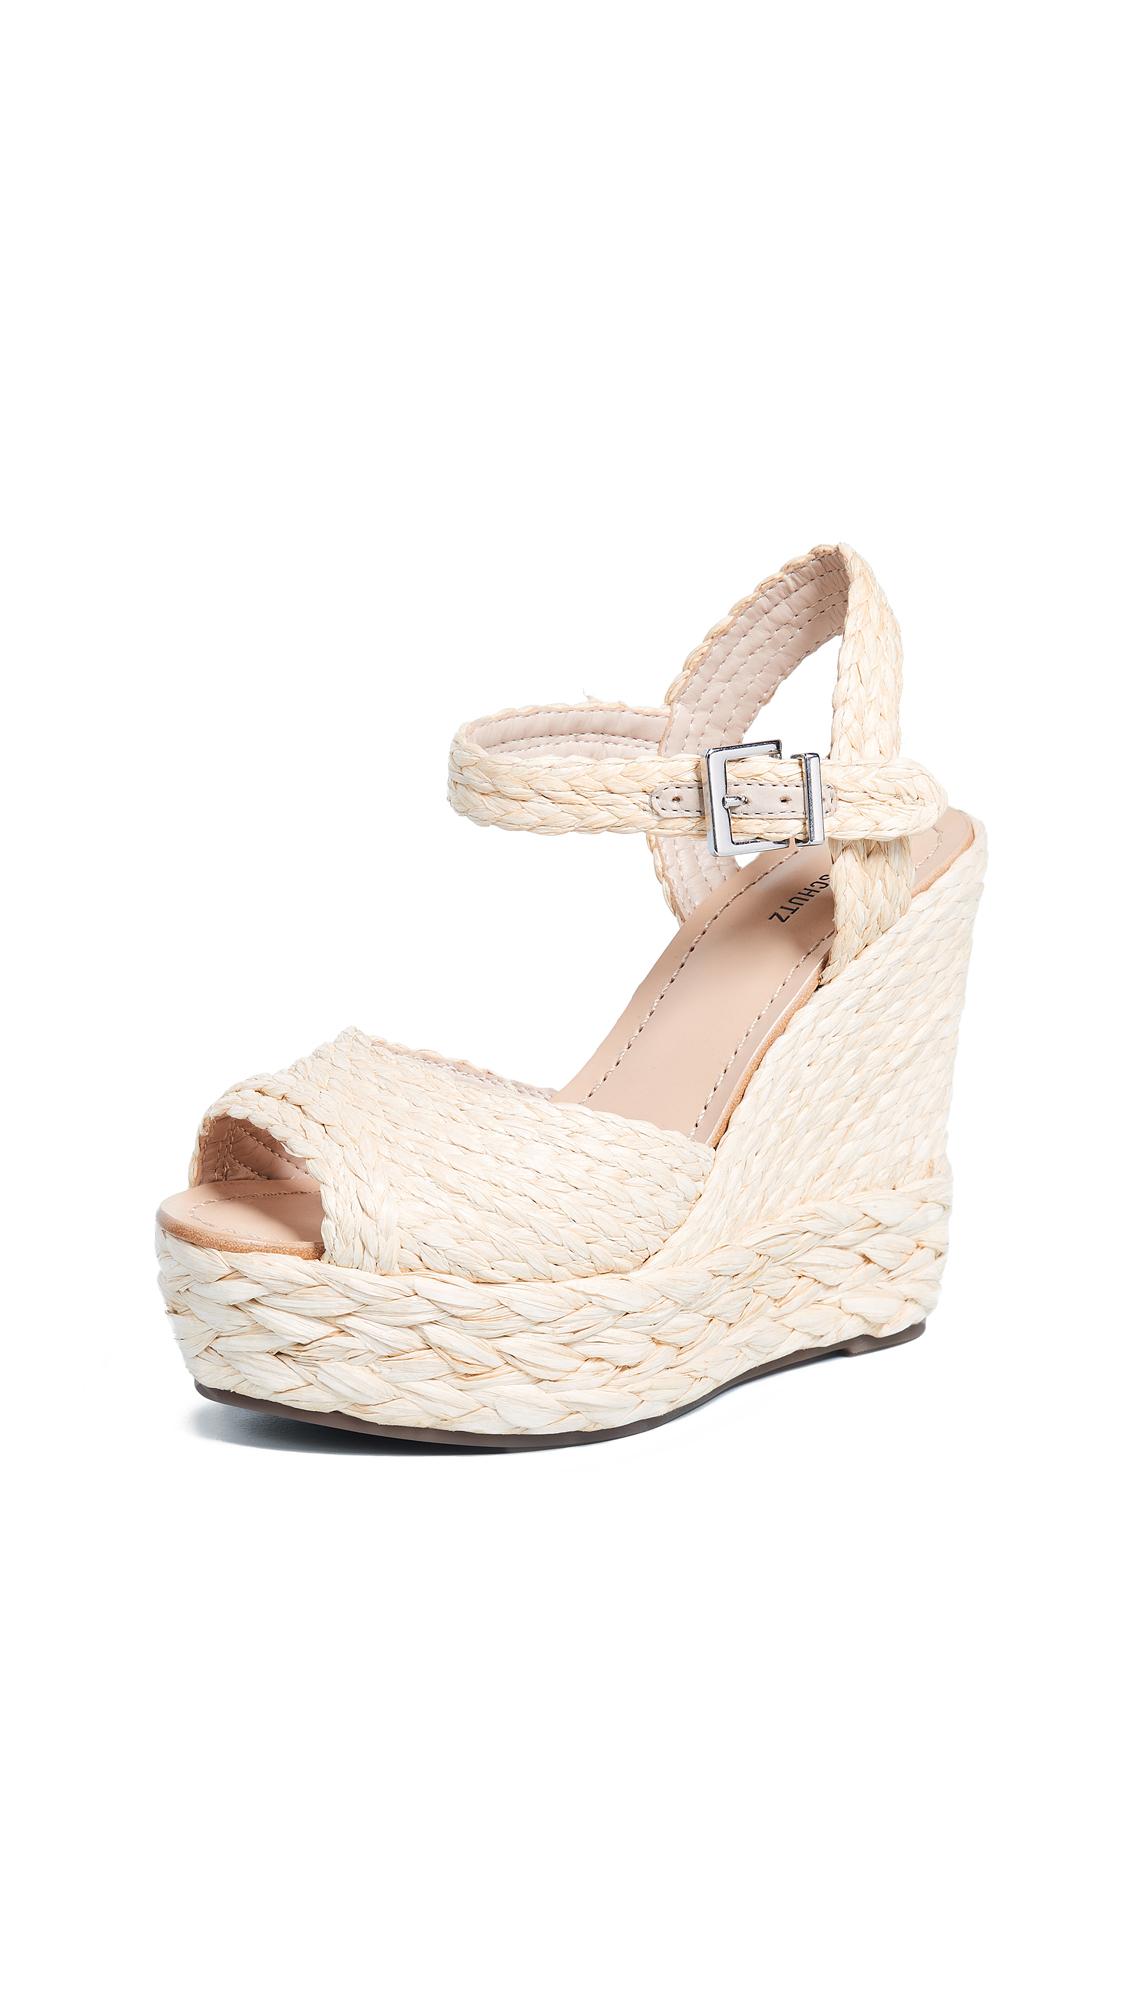 Schutz Belatrix Espadrille Sandals - Natural